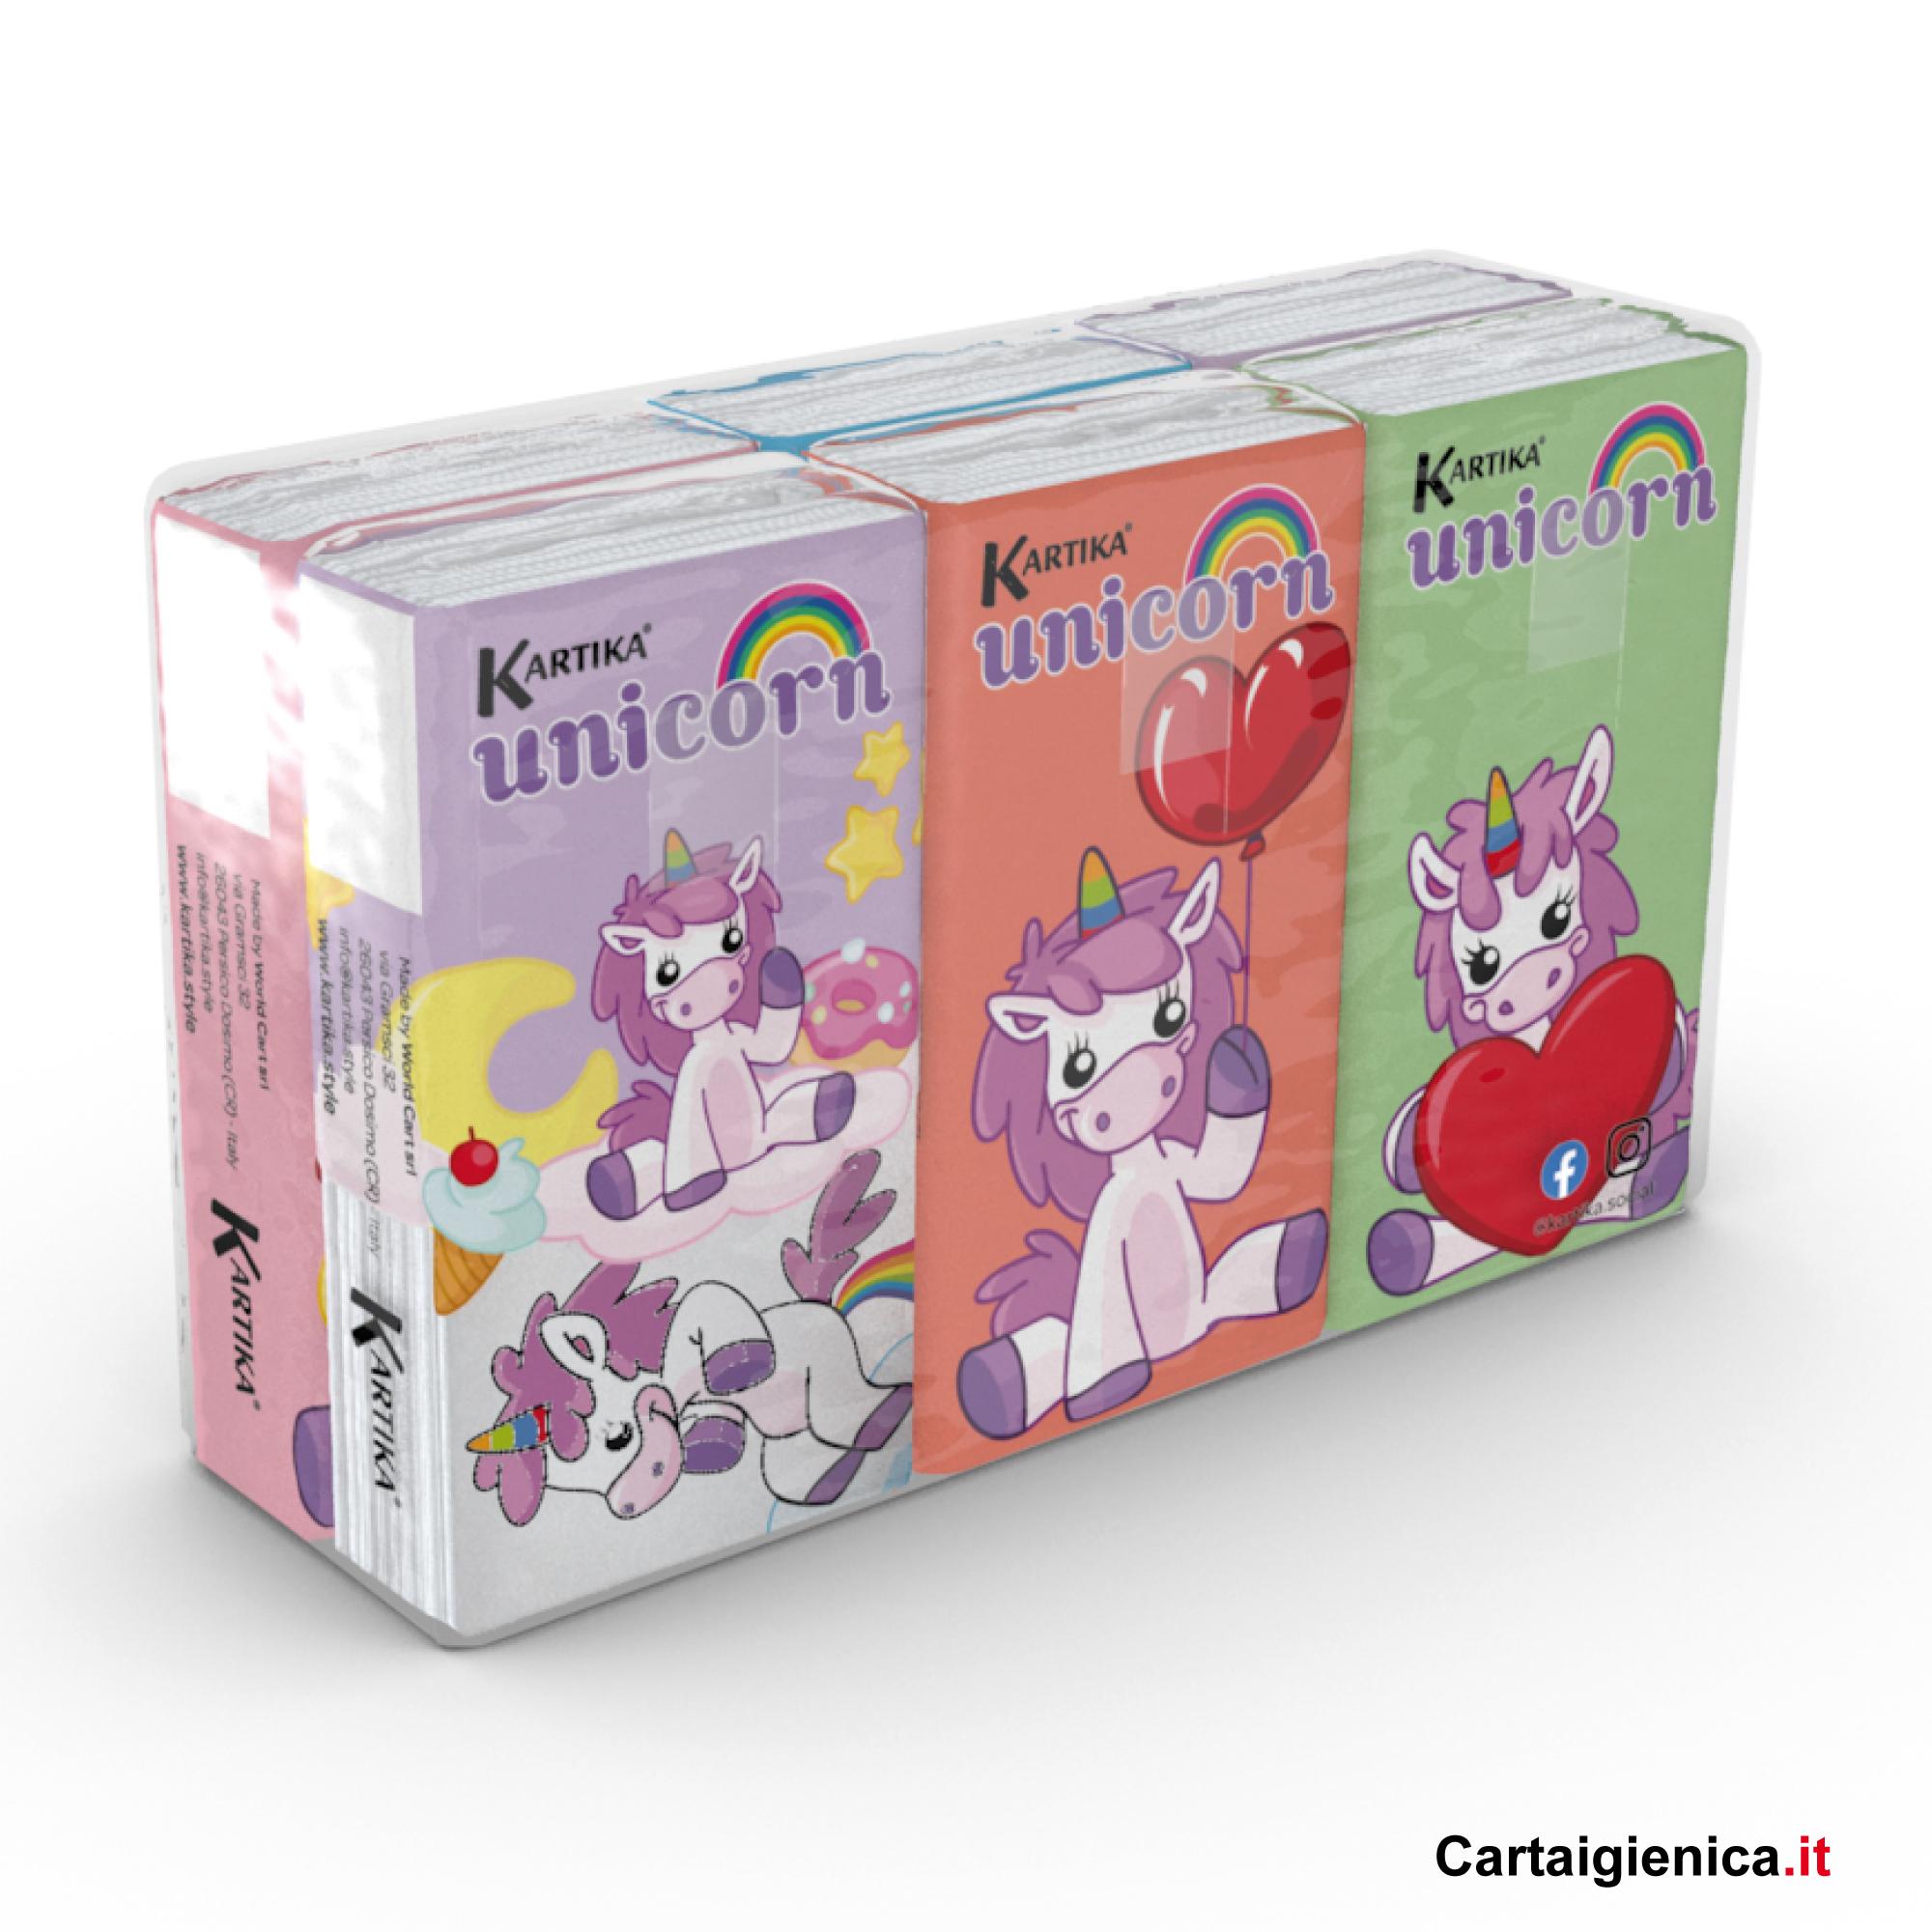 fazzoletti unicorn Kartika Style 6 pacchetti bambini colorati